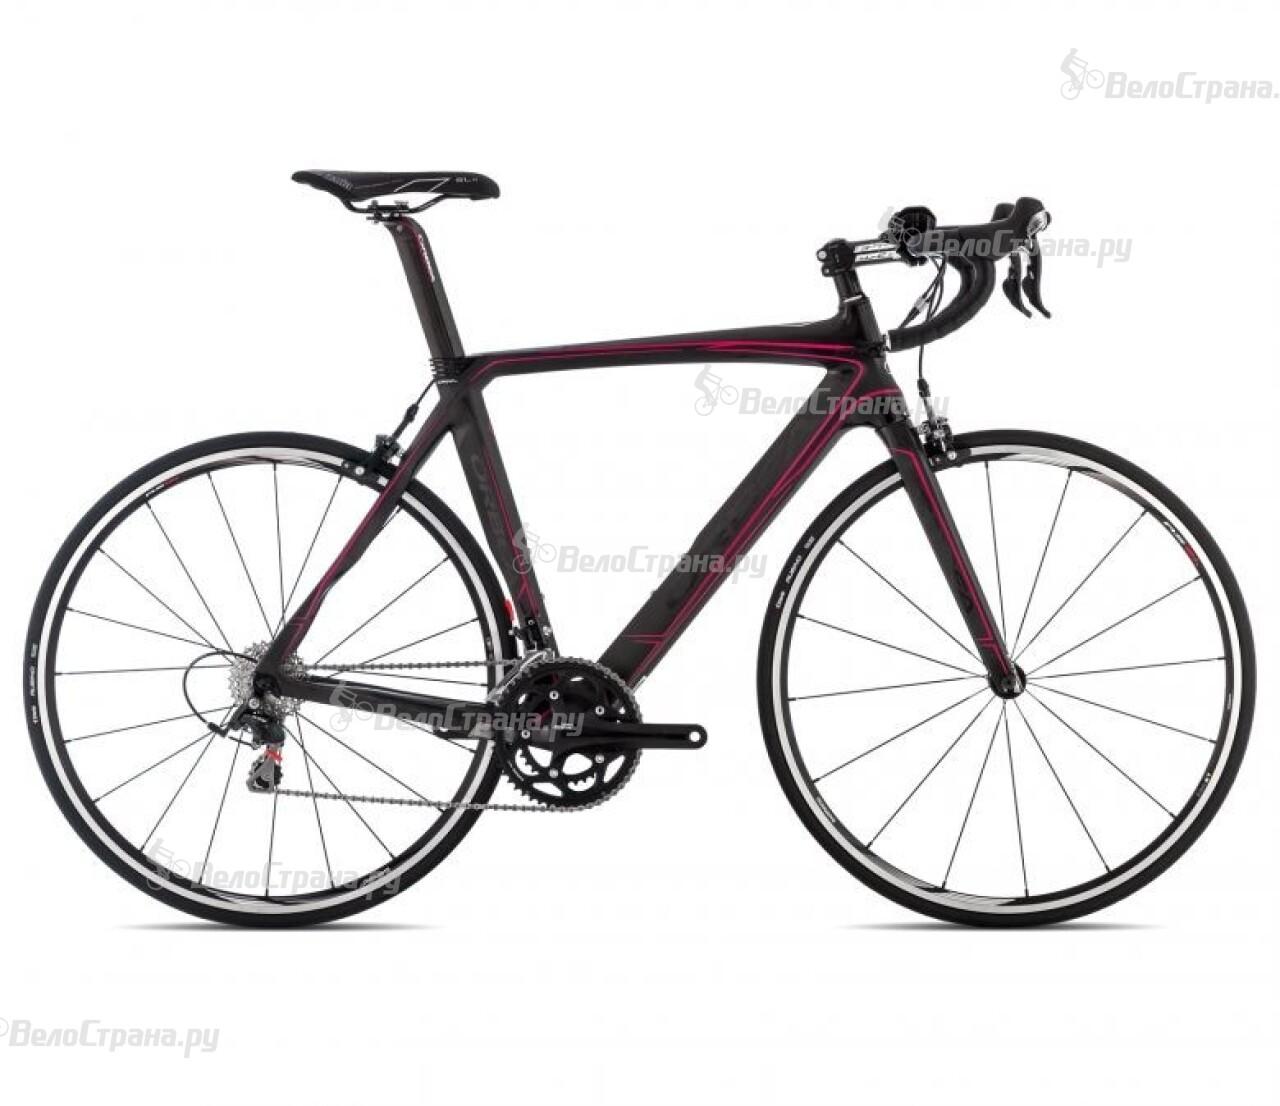 Велосипед Orbea Orca Tri M50 (2014) аккумулятор для ноутбука oem 5200mah asus n61 n61j n61d n61v n61vg n61ja n61jv n53 a32 m50 m50s n53s n53sv a32 m50 a32 n61 a32 x 64 33 m50 n53s n53 a32 m50 m50s n53s n53sv a32 m50